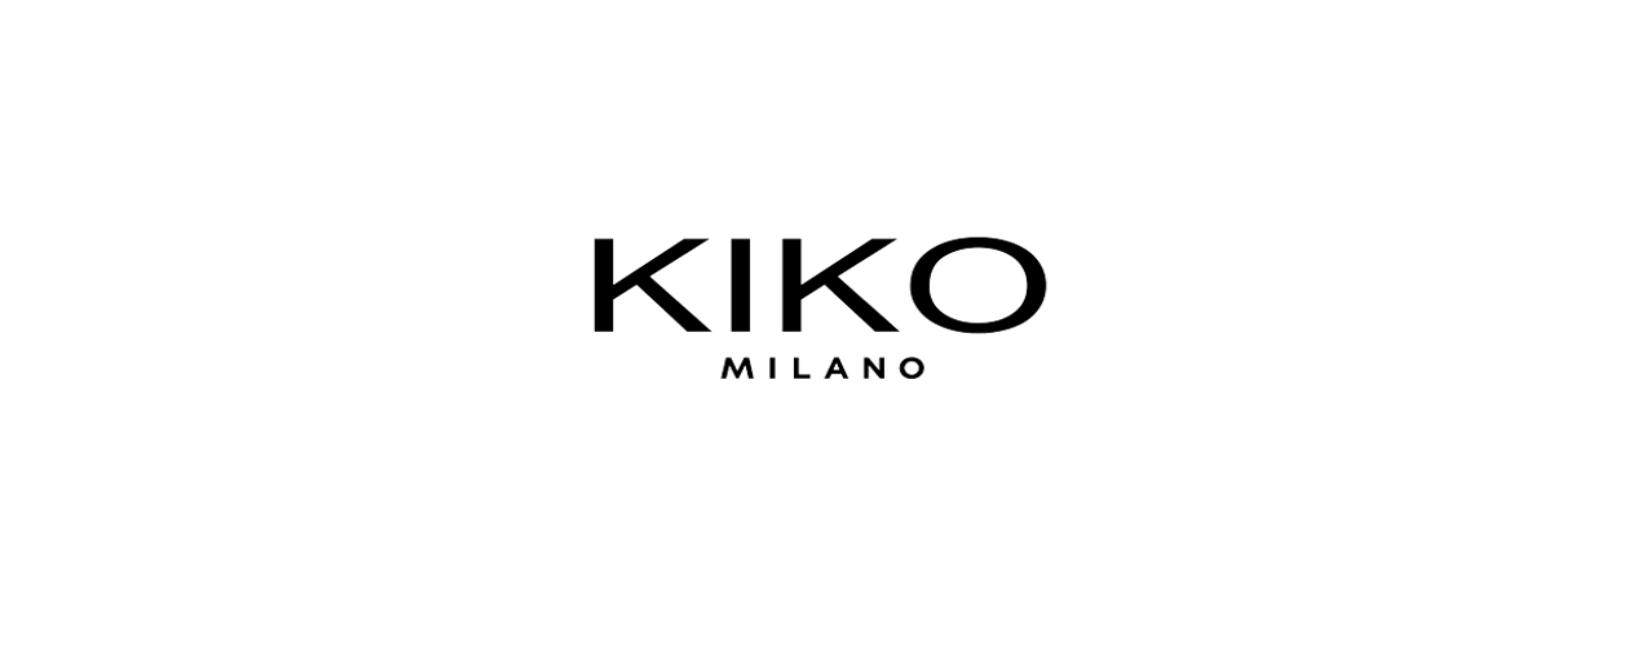 Kiko Milano Discount Code 2021